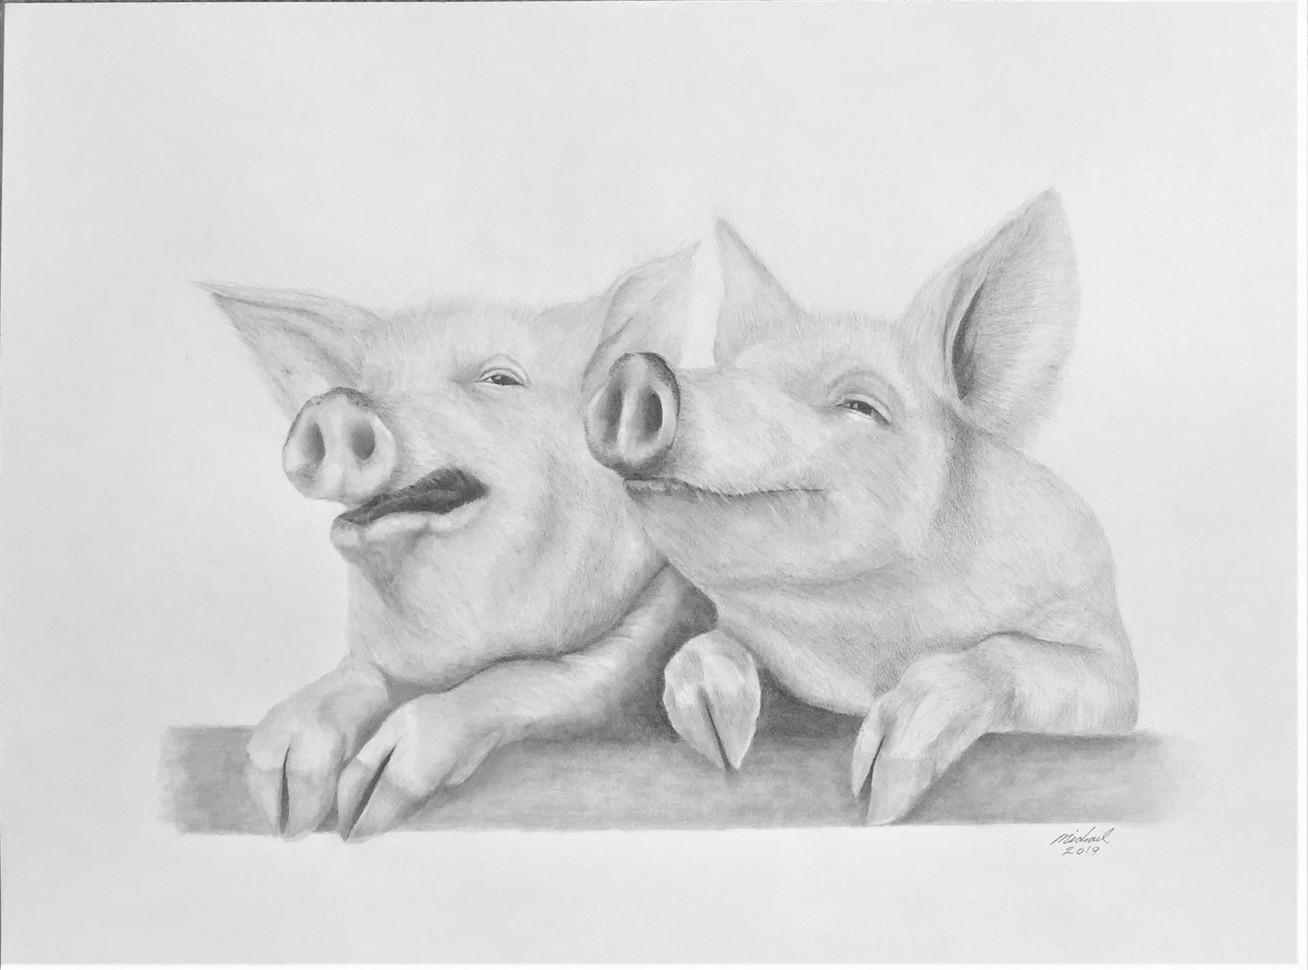 "Michael Souza (Turlock), Pig Heaven, 2019 Graphite on paper, 18"" x 24"" $450"